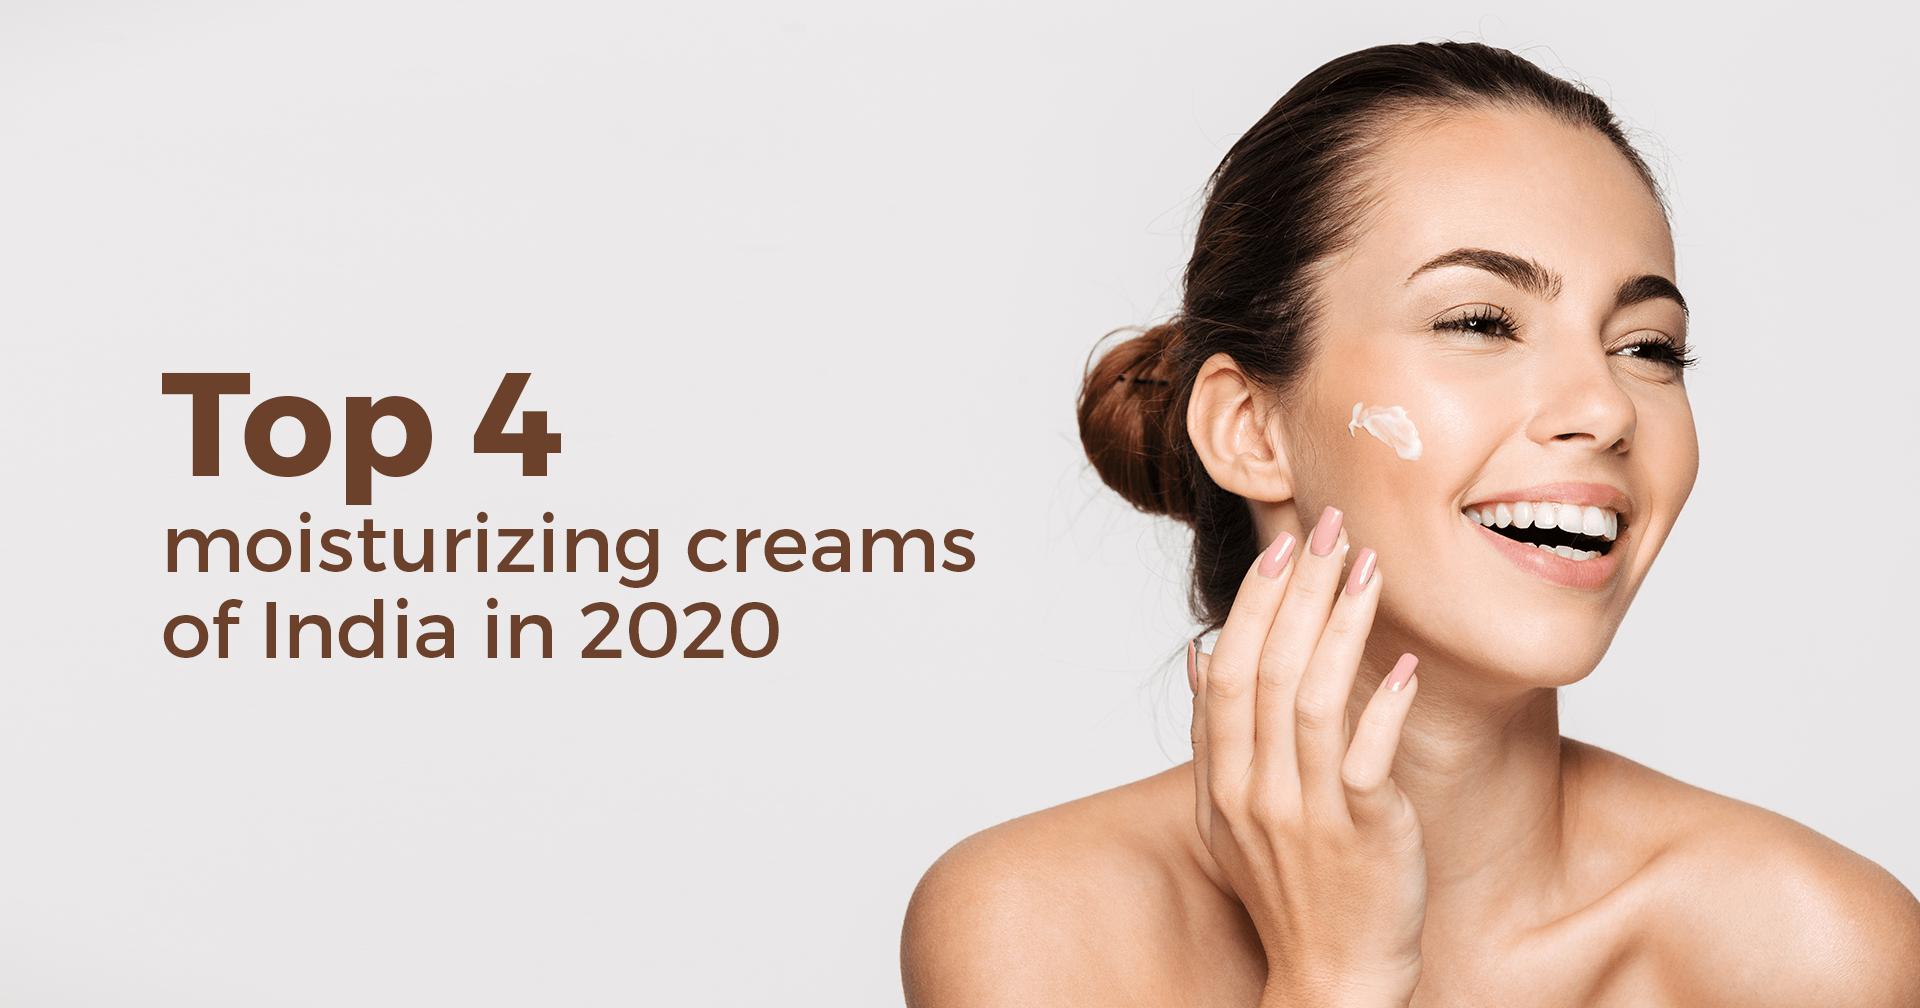 Top 4 moisturizing creams of India in 2020 - Rivona